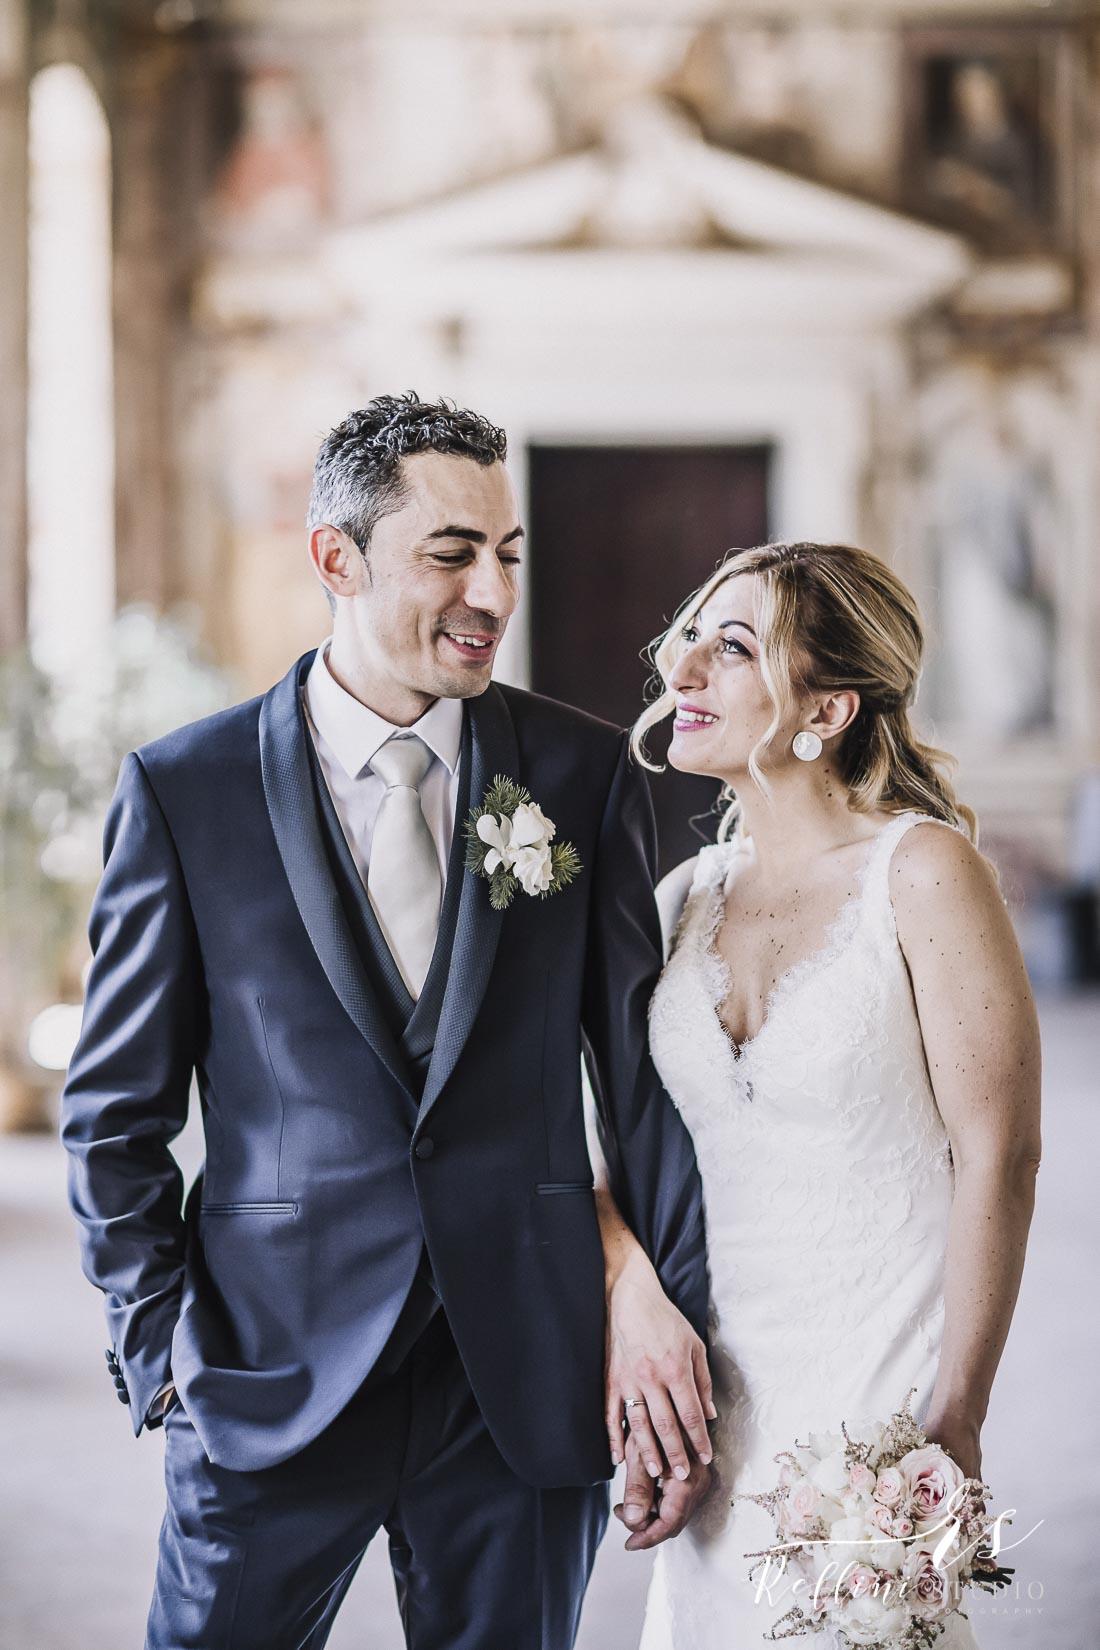 Wedding photographer Umbria, Italy